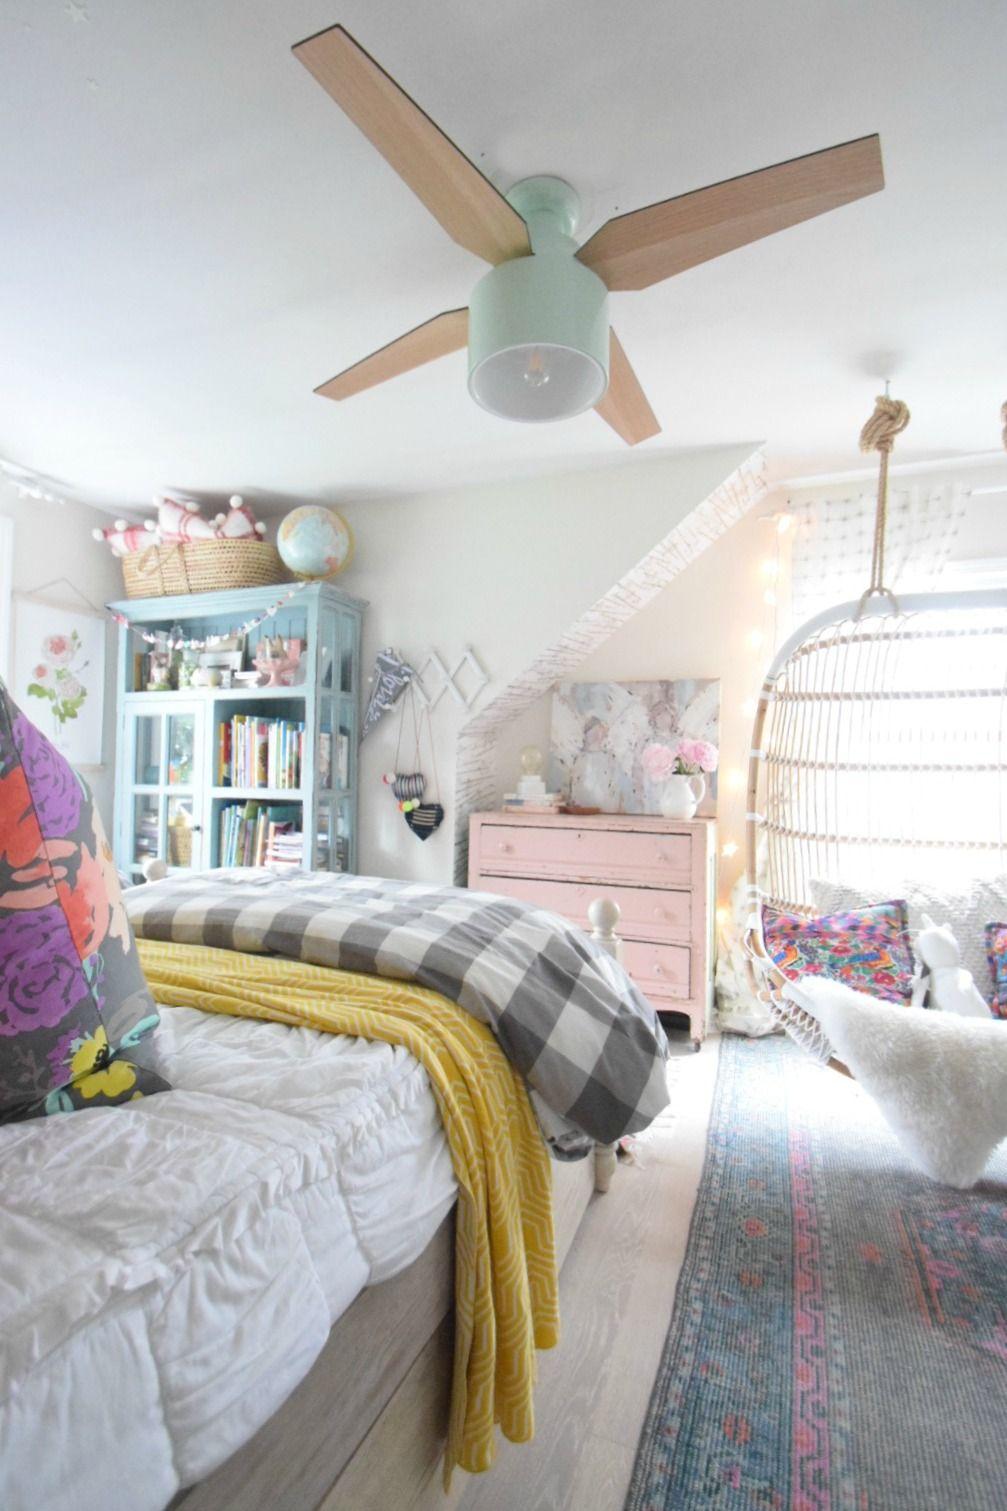 Modern Romantic Bedroom Designs: Romantic Bedroom Decor, Stylish